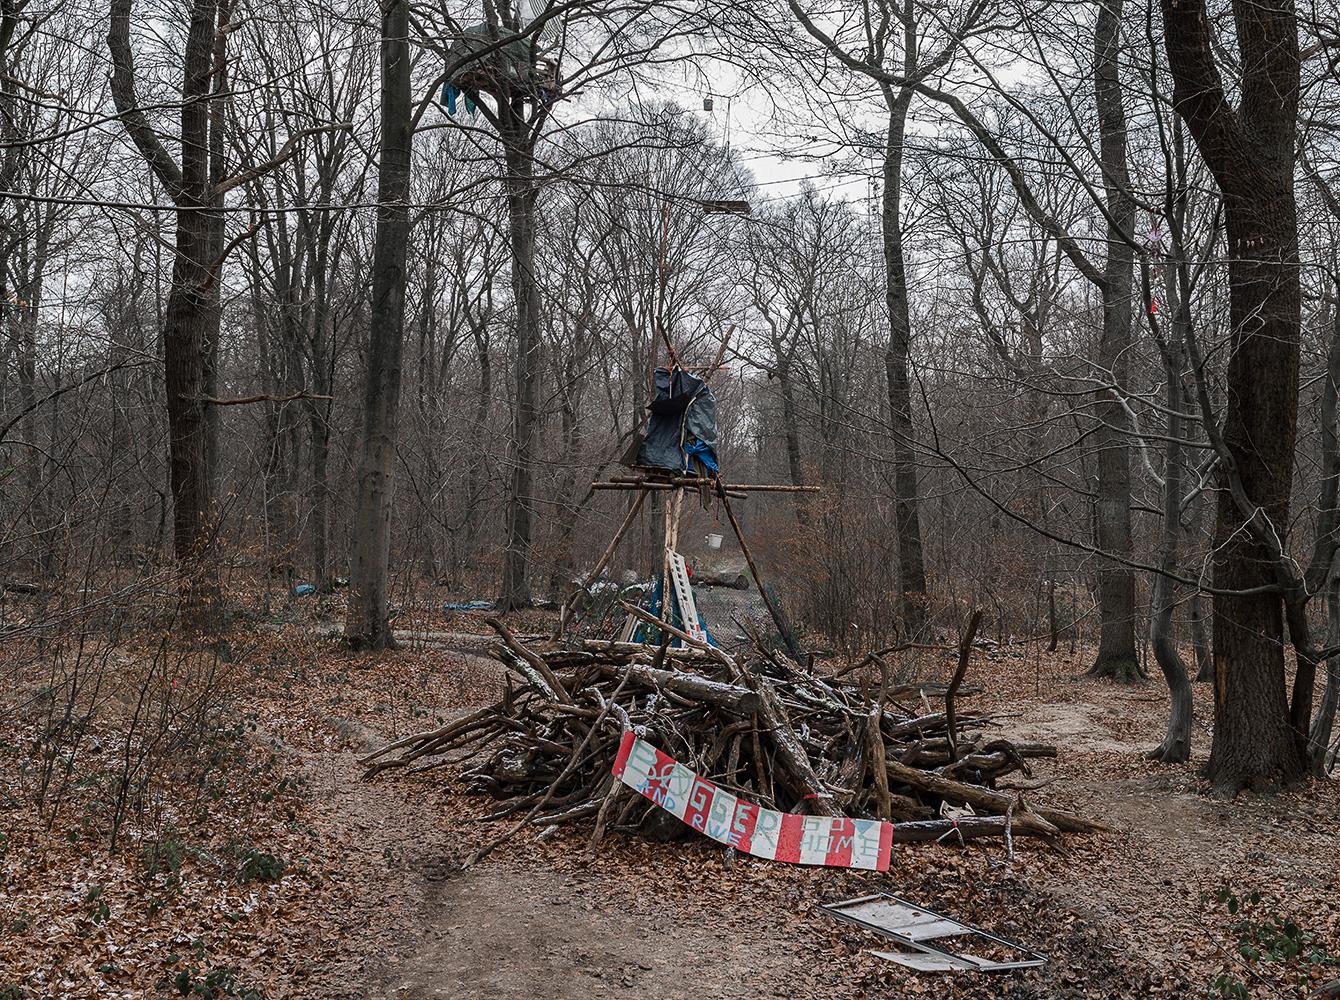 Barrikaden, Hambacher Forst